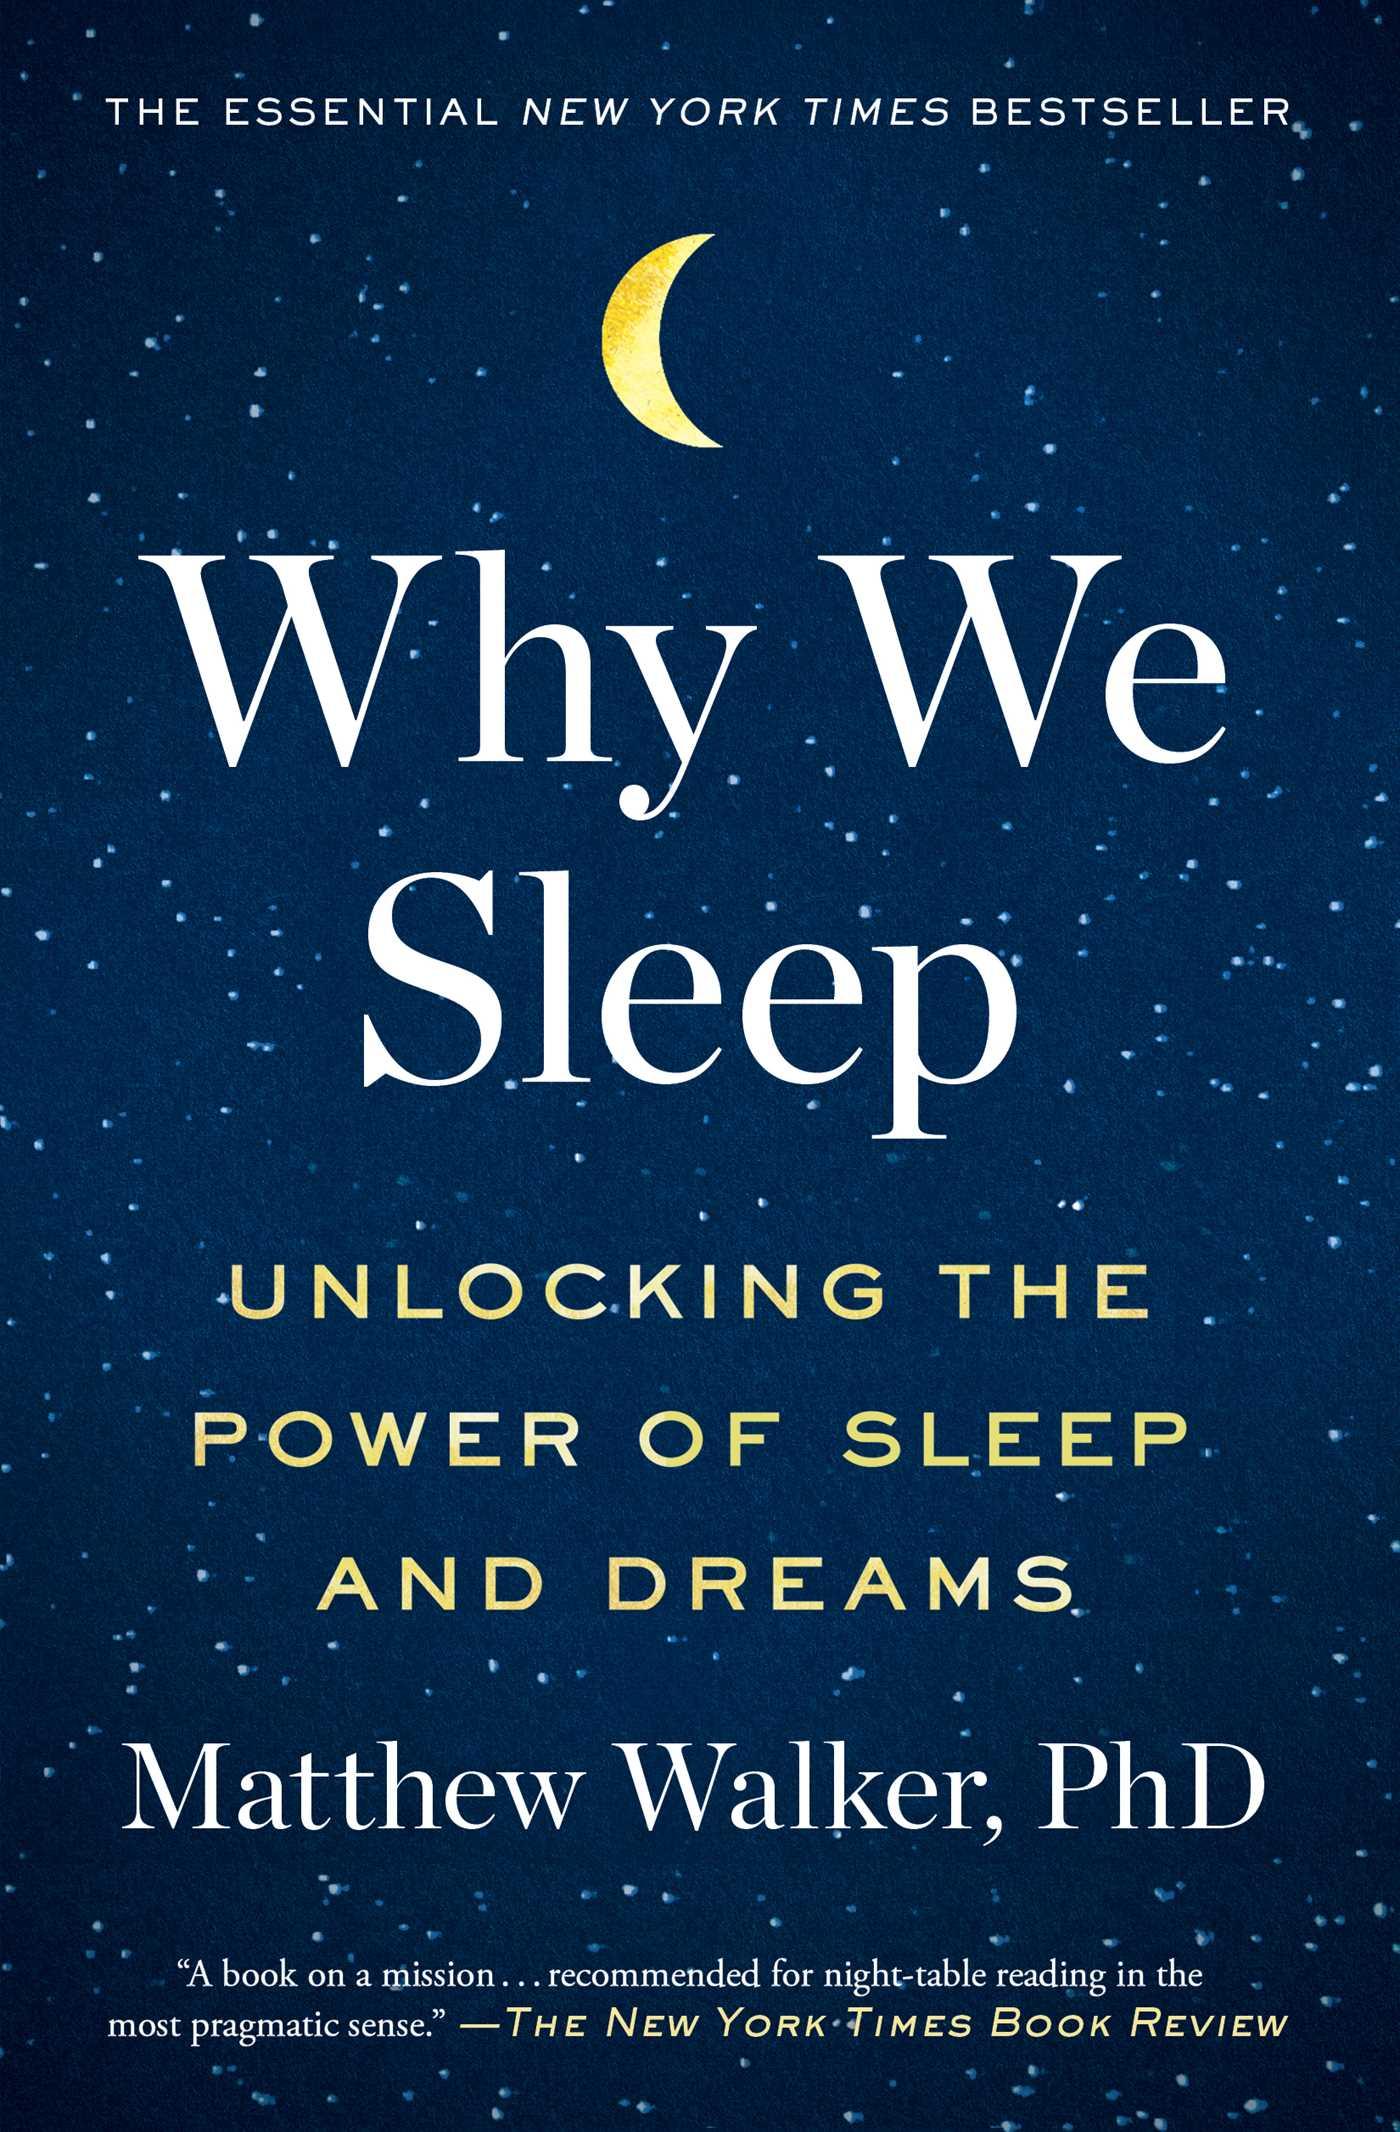 Why we sleep 9781501144332 hr